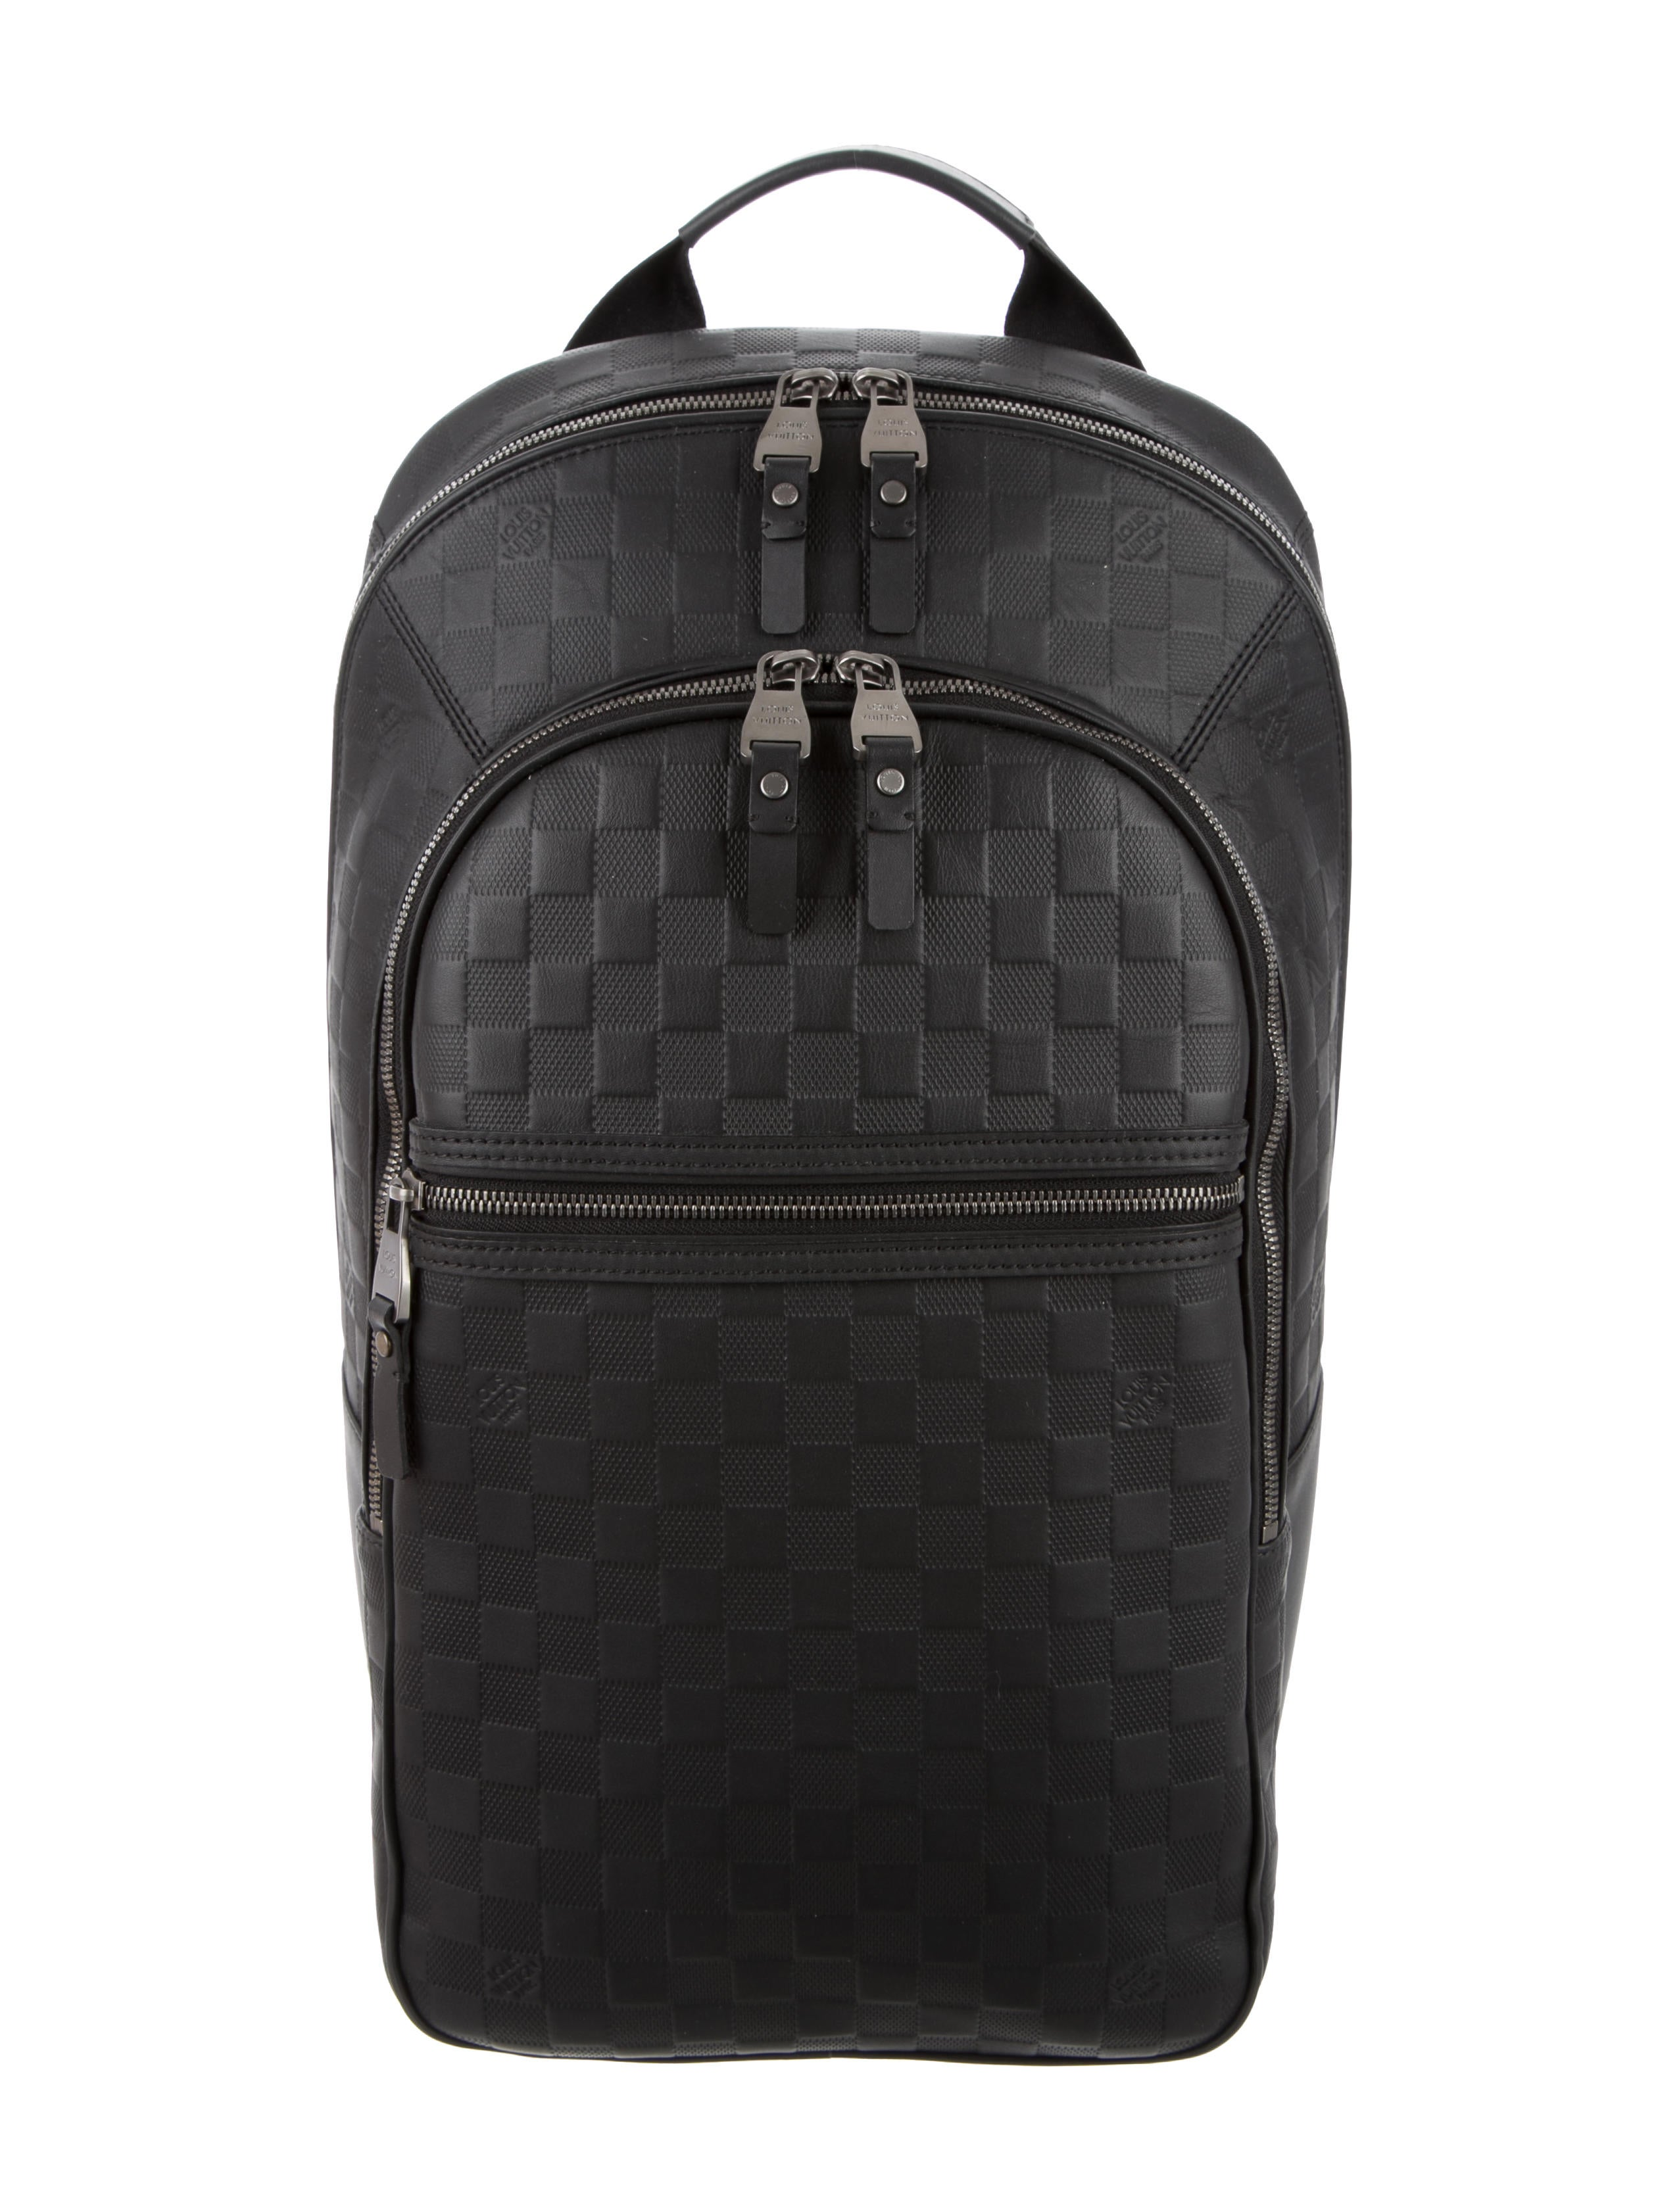 Louis Vuitton Damier Infini Michael Backpack Bags